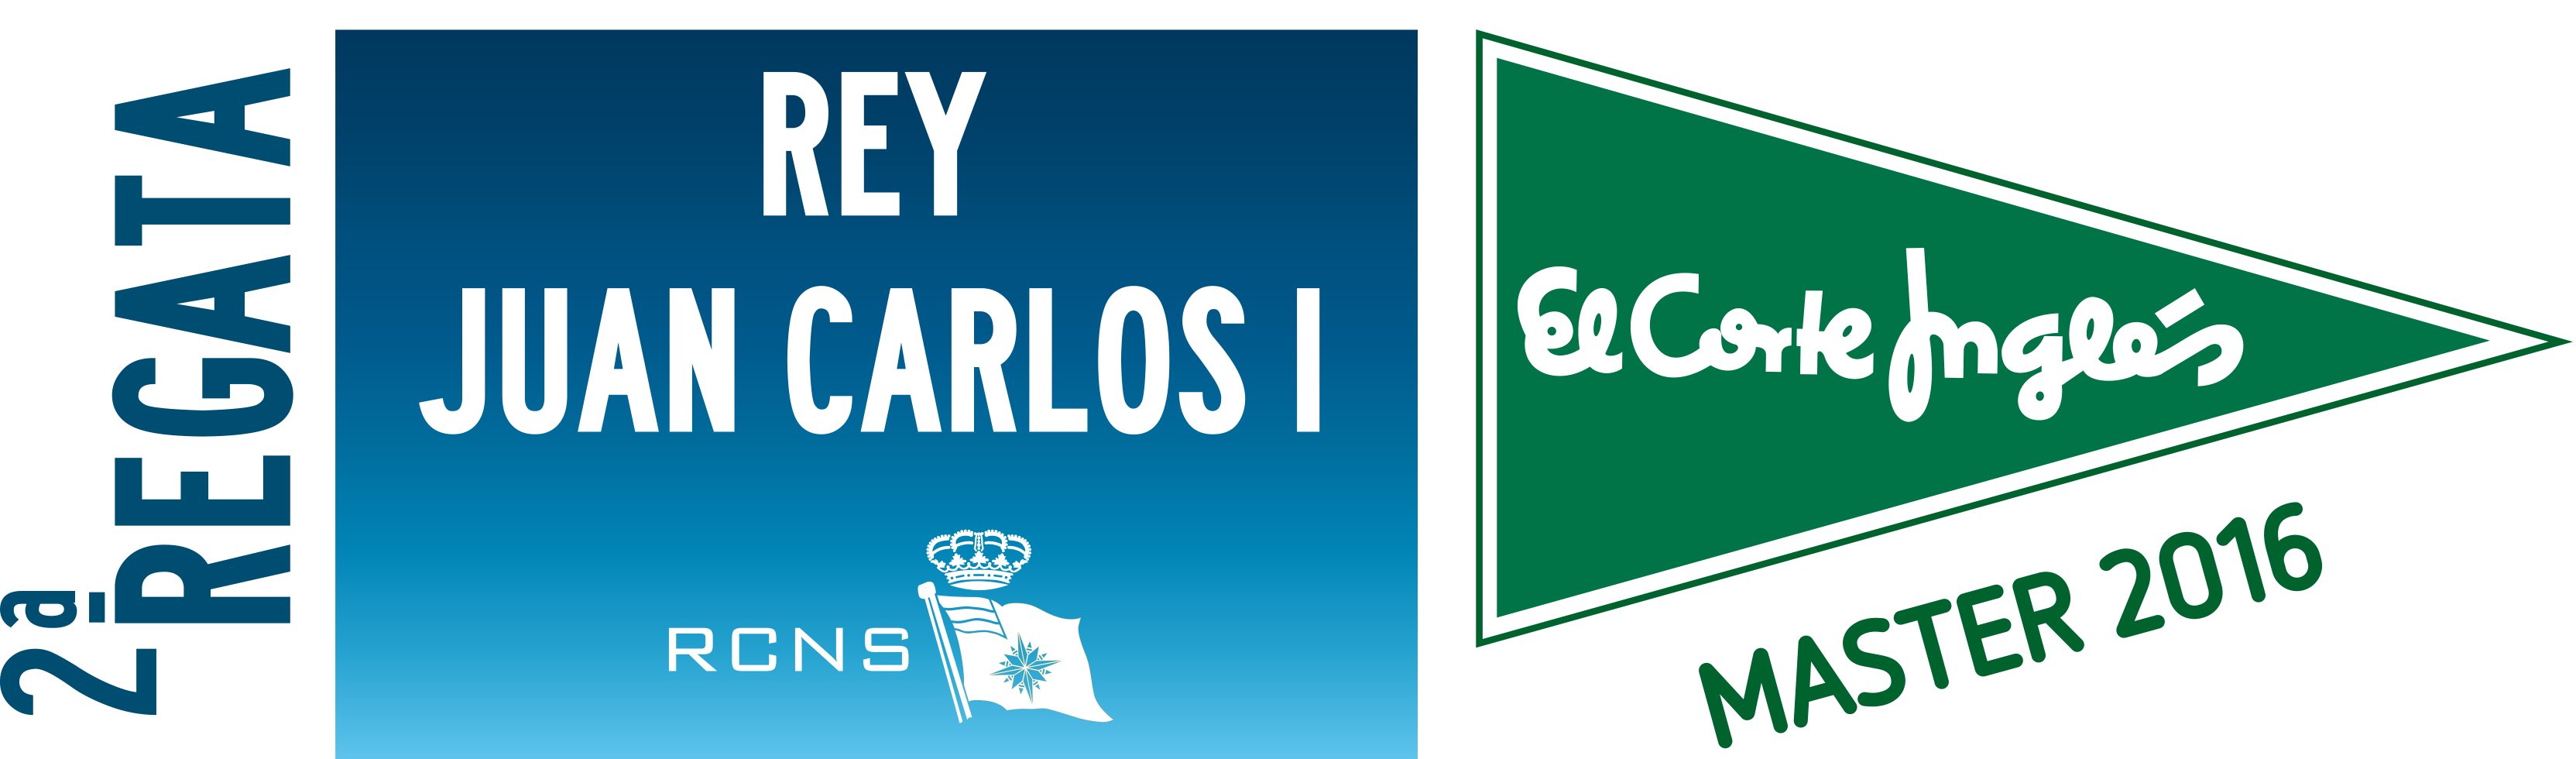 II Regata Rey Juan Carlos - 2016